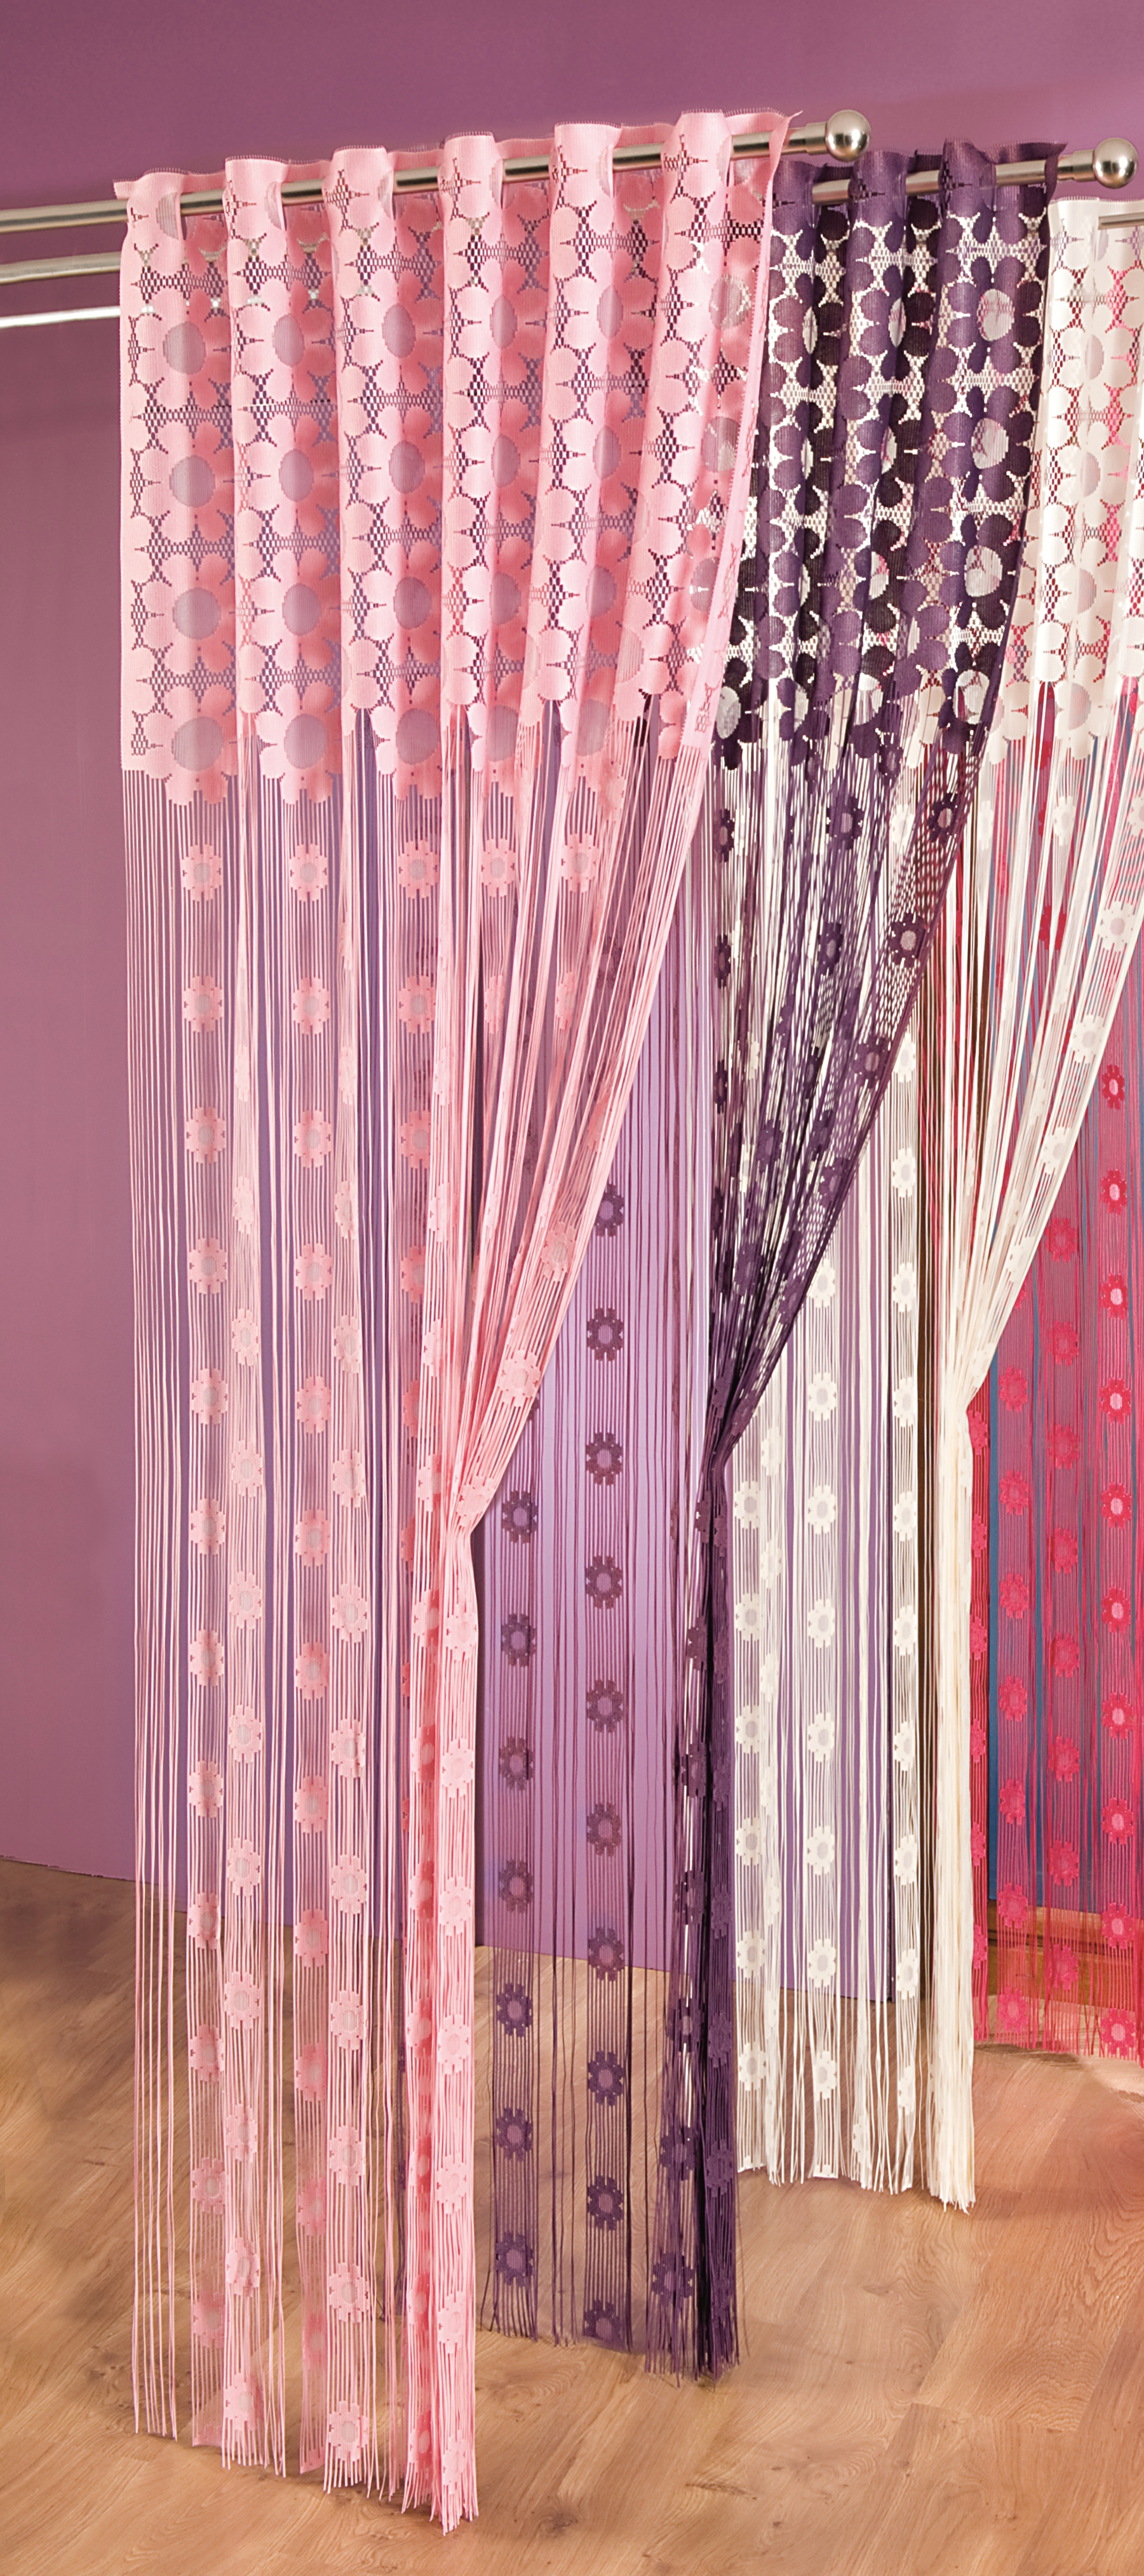 Шторы Wisan Нитяные шторы Lolicia Цвет: Розовый wisan wisan нитяные шторы joelle цвет кремовый бежевый